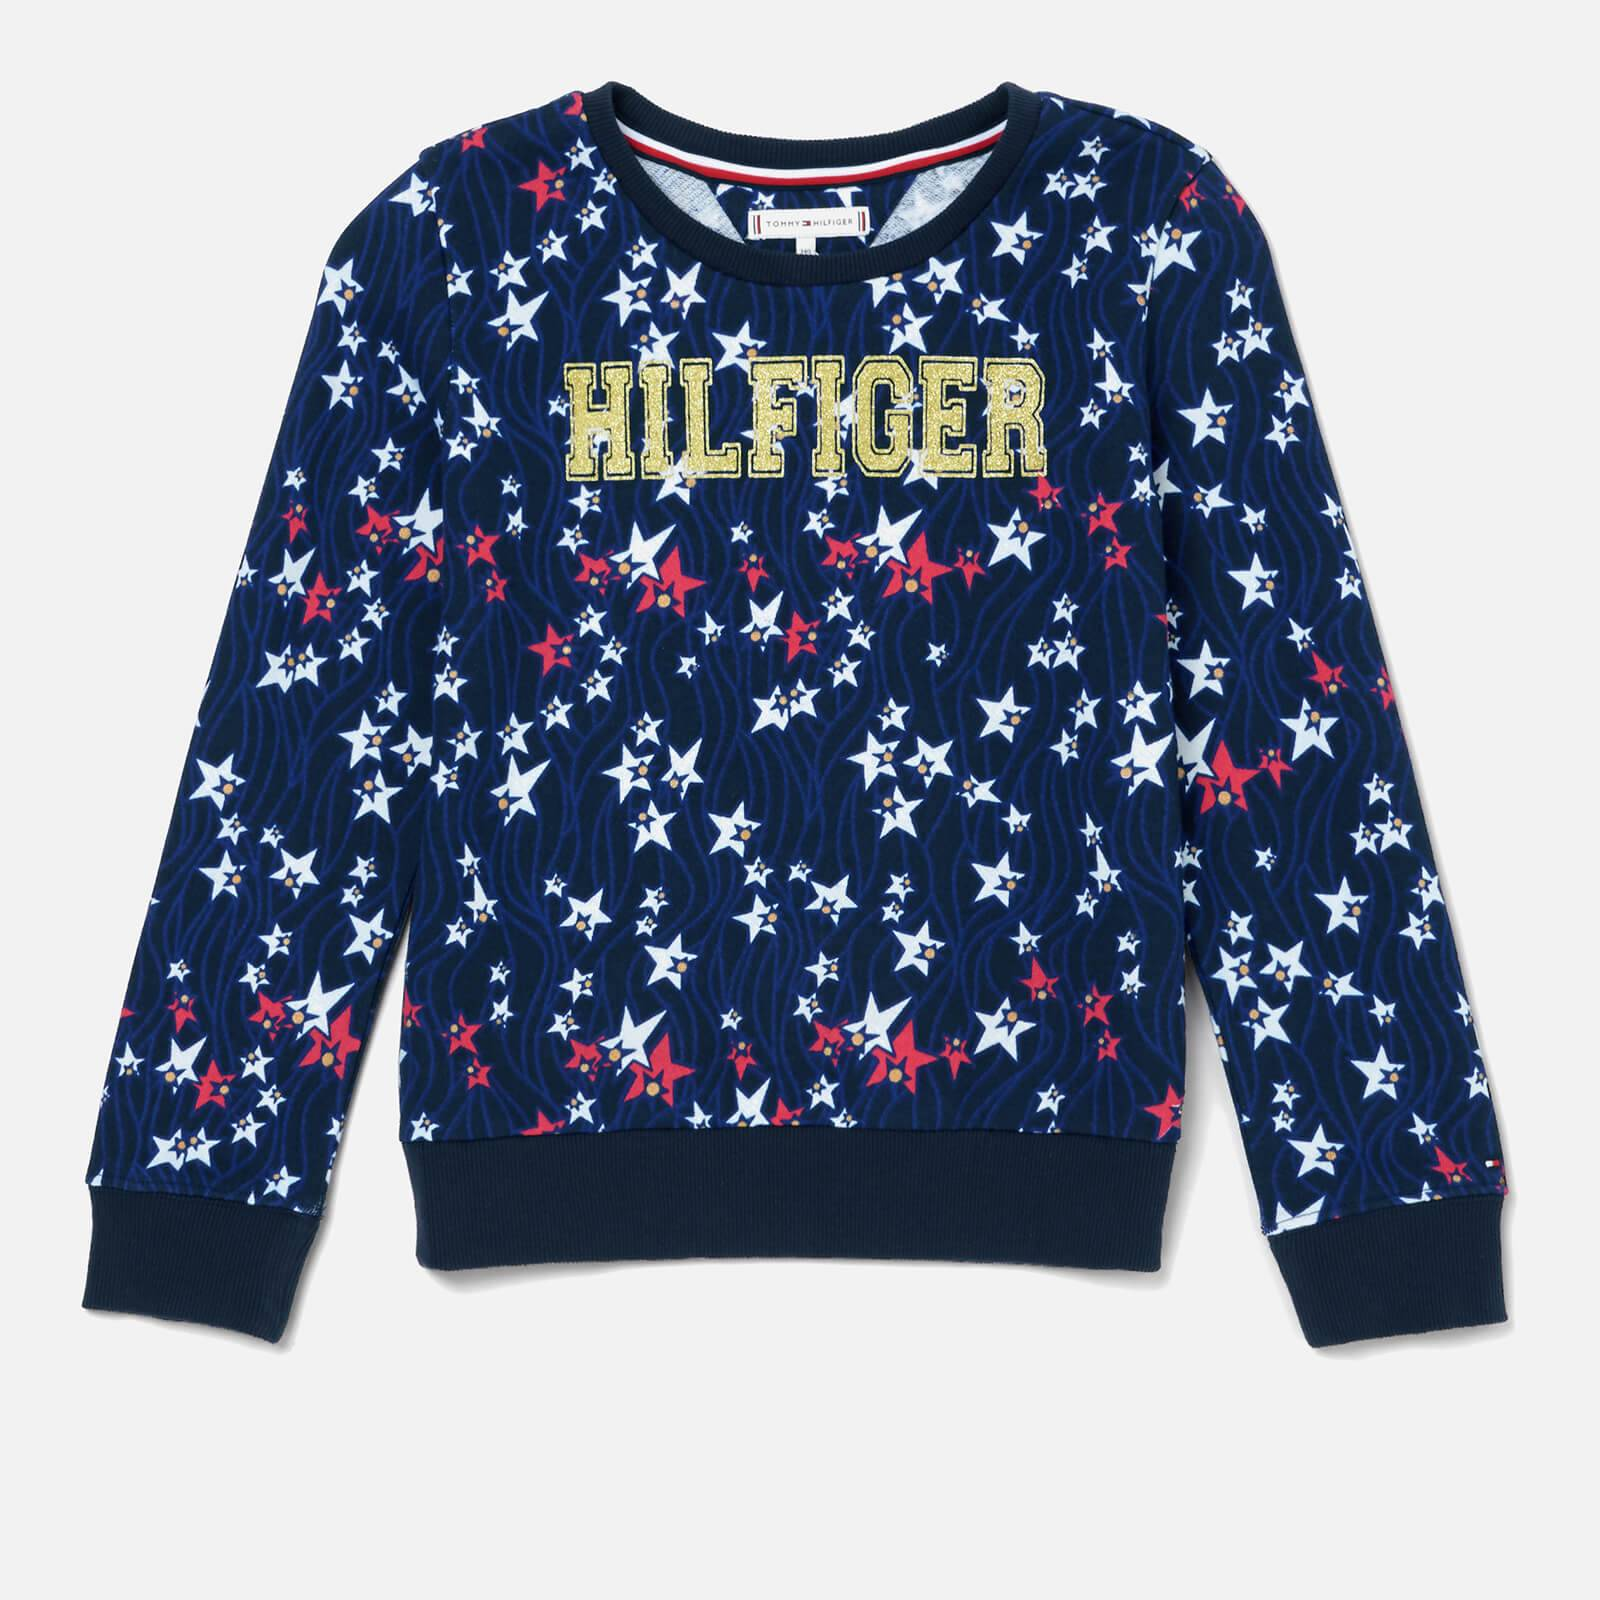 Tommy Hilfiger Girls' Flowing Stars Sweatshirt - Black Iris/Multi - 6 Years - Multi